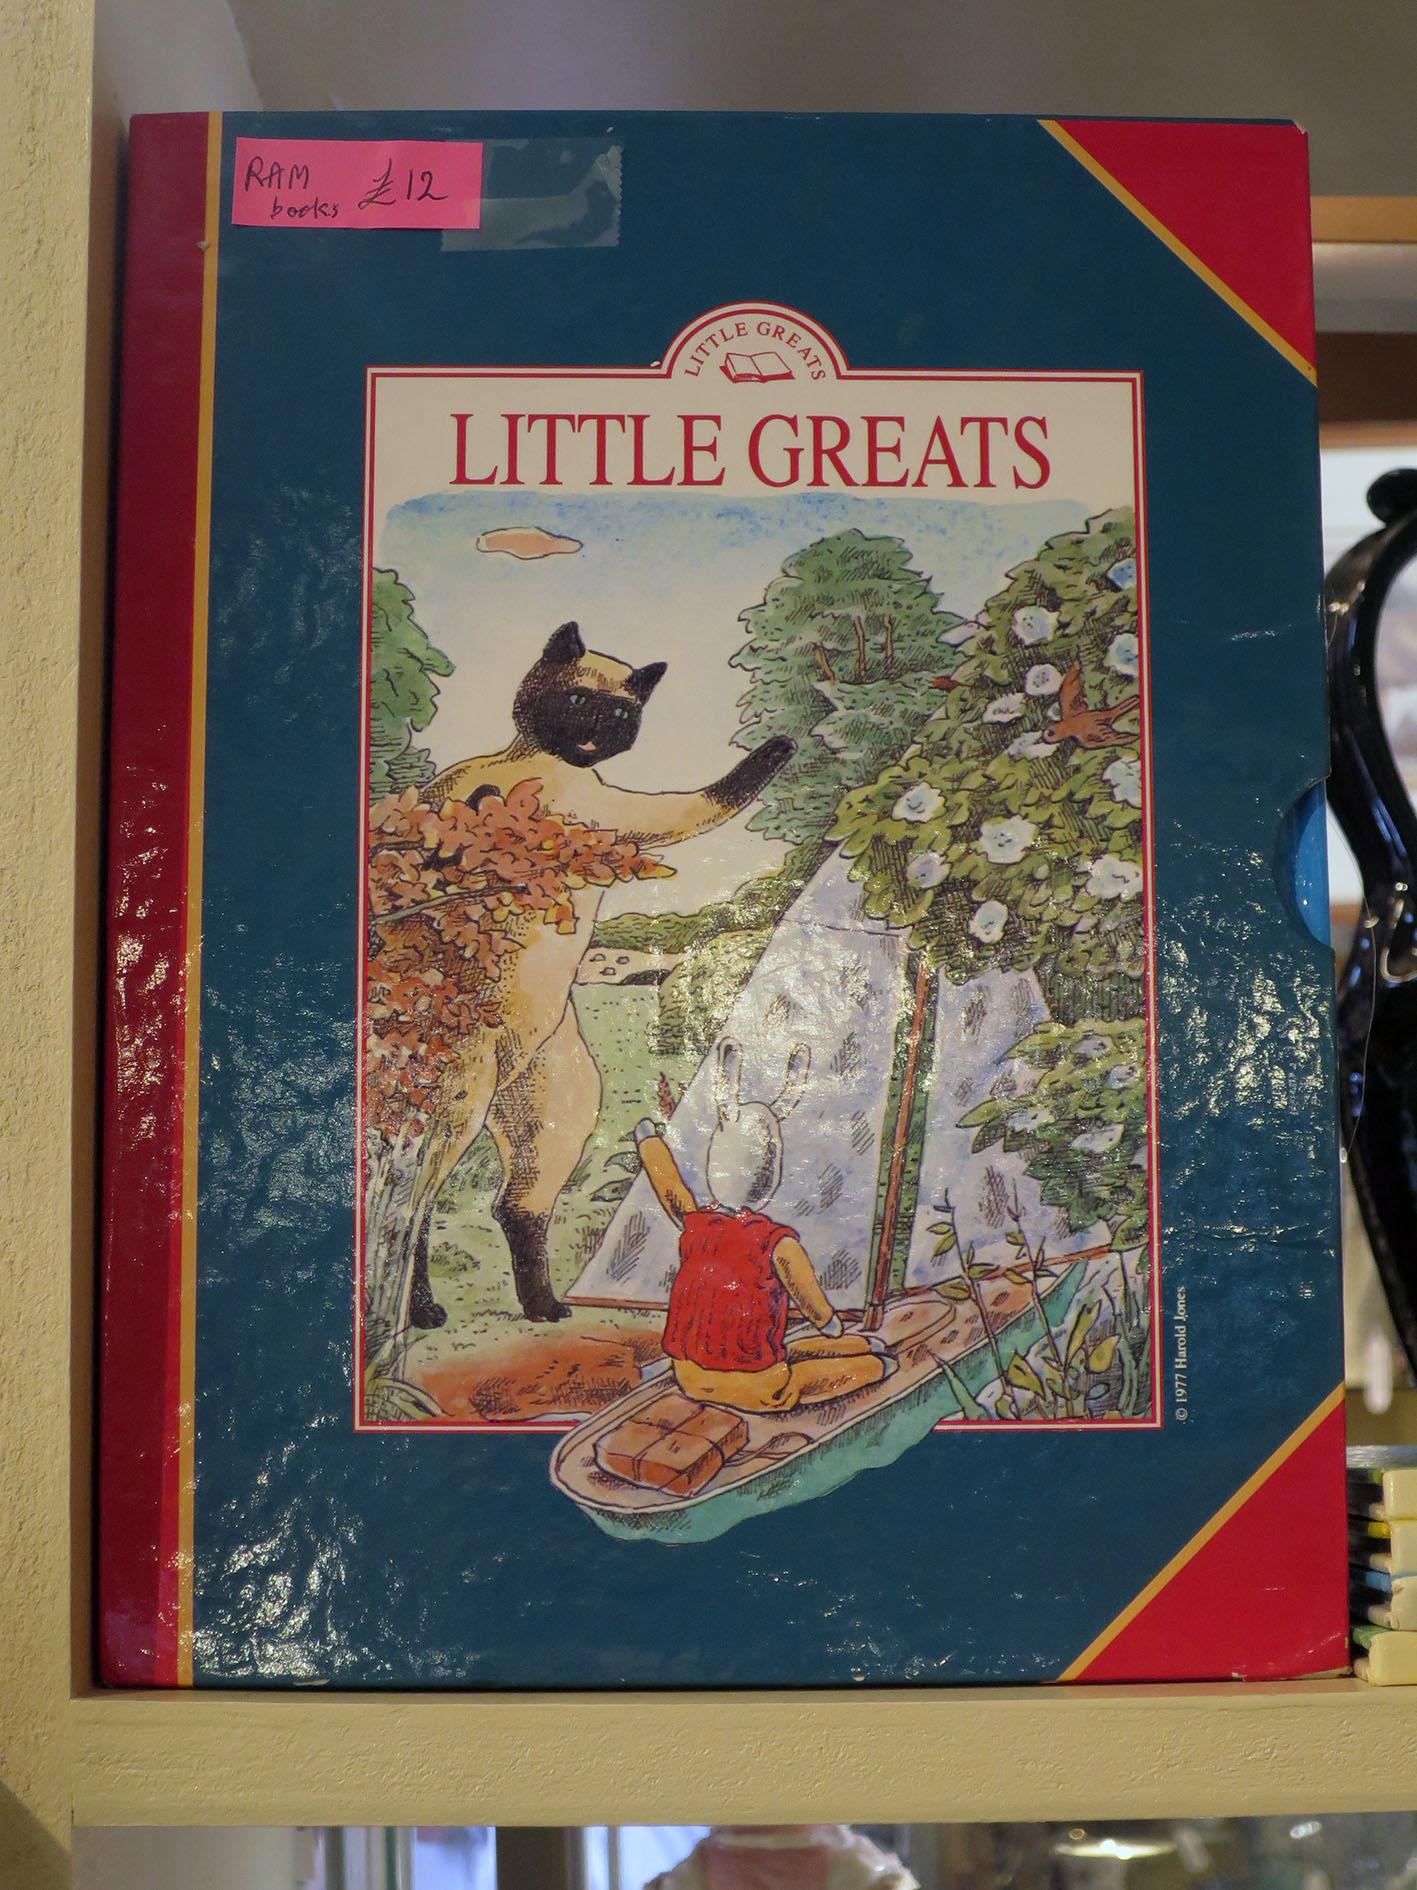 Sail_Loft_Little_Greats